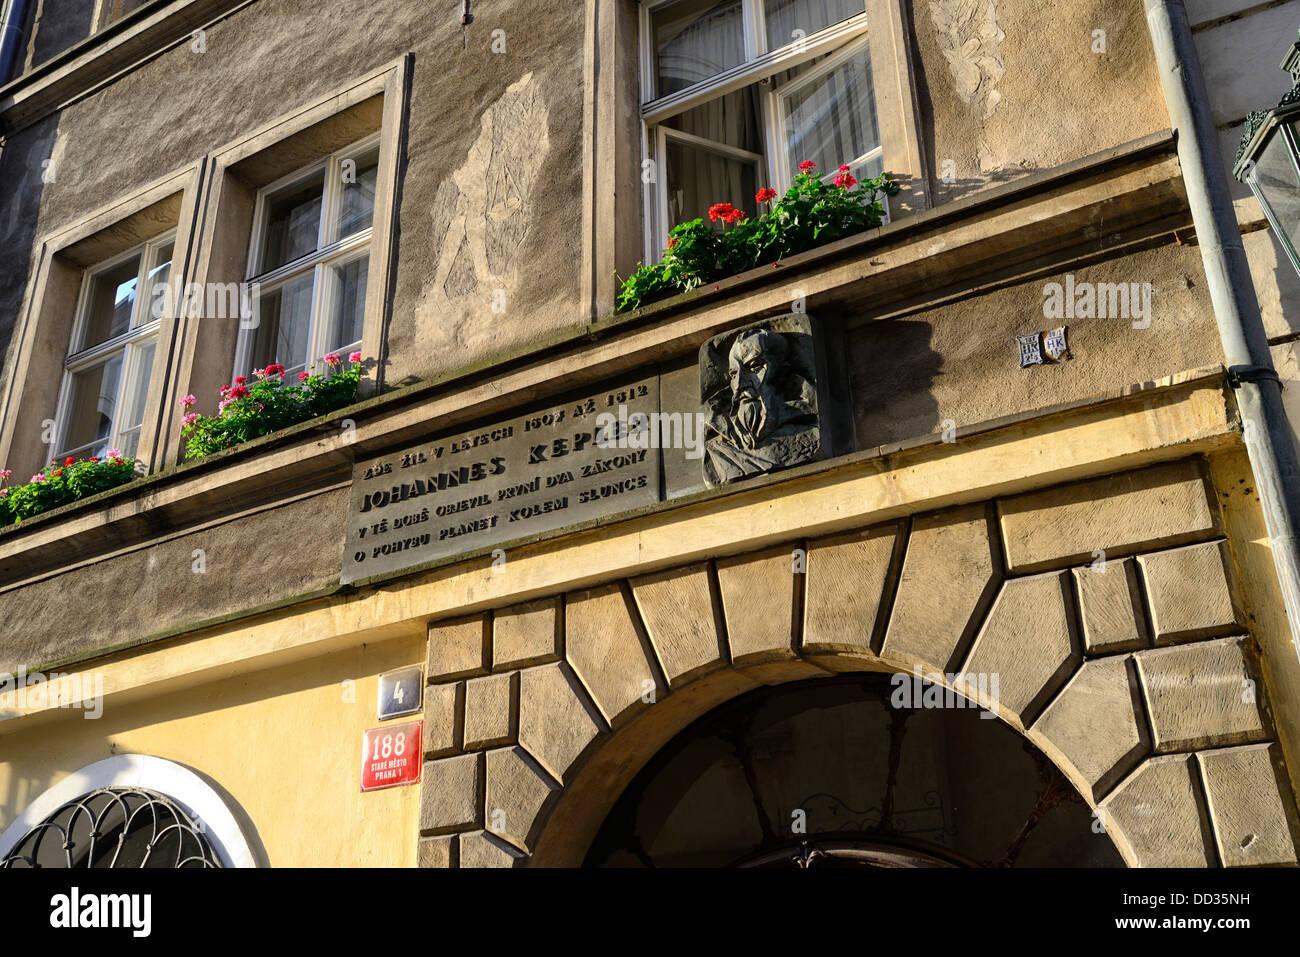 House lived in by Johannes Kepler near Charles Bridge, Prague, Czech Republic, Europe - Stock Image